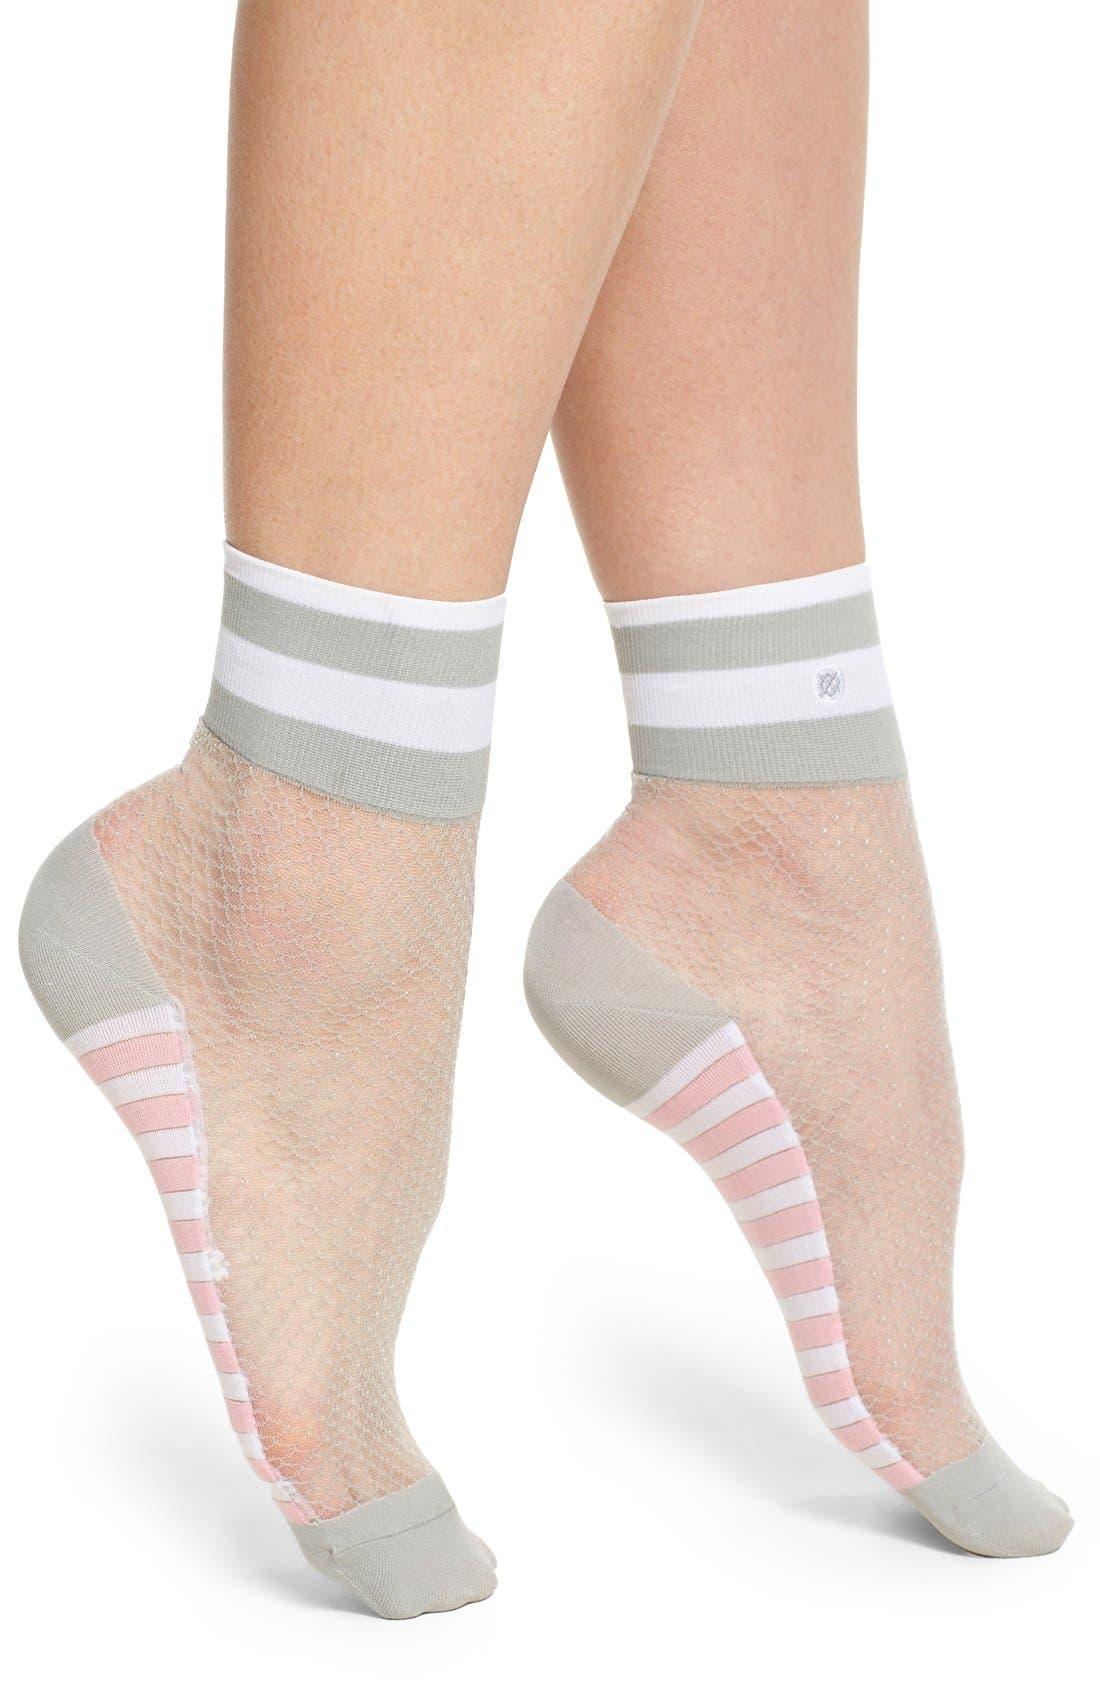 Main Image - Stance x Rihanna 'Spoiled Brat' Anklet Socks